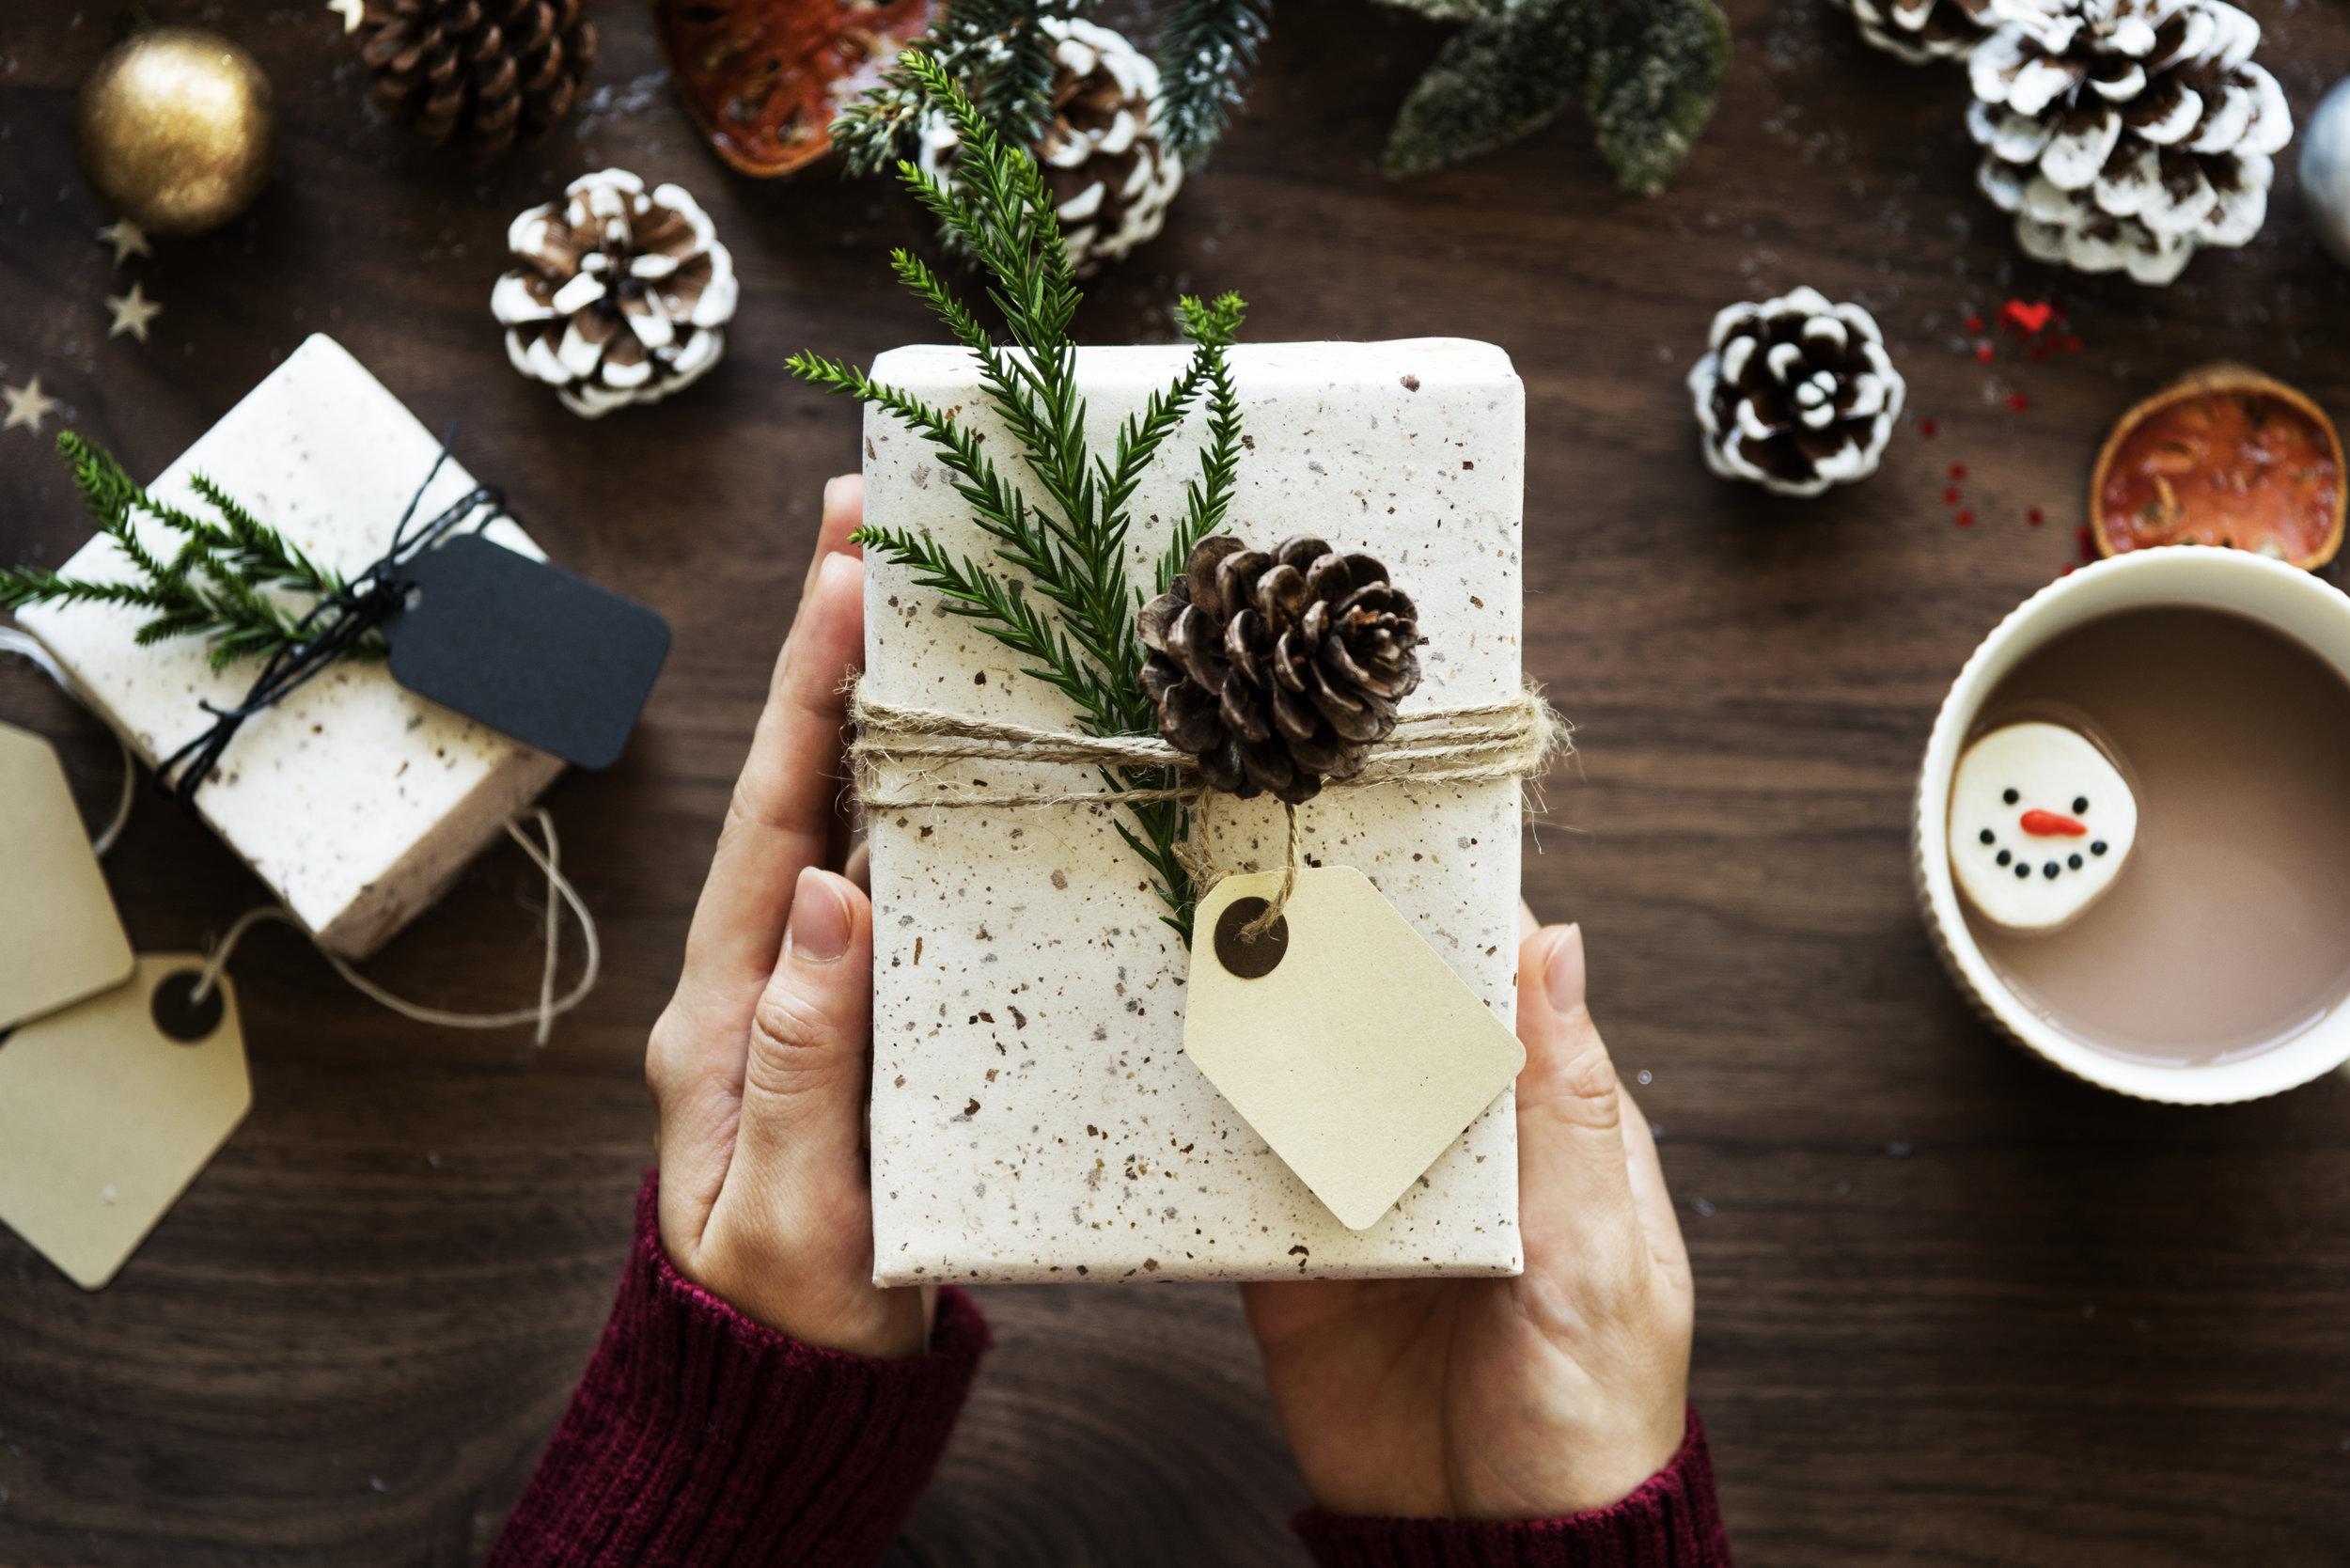 chrsitmas-gift-wrapping-ideas.jpg